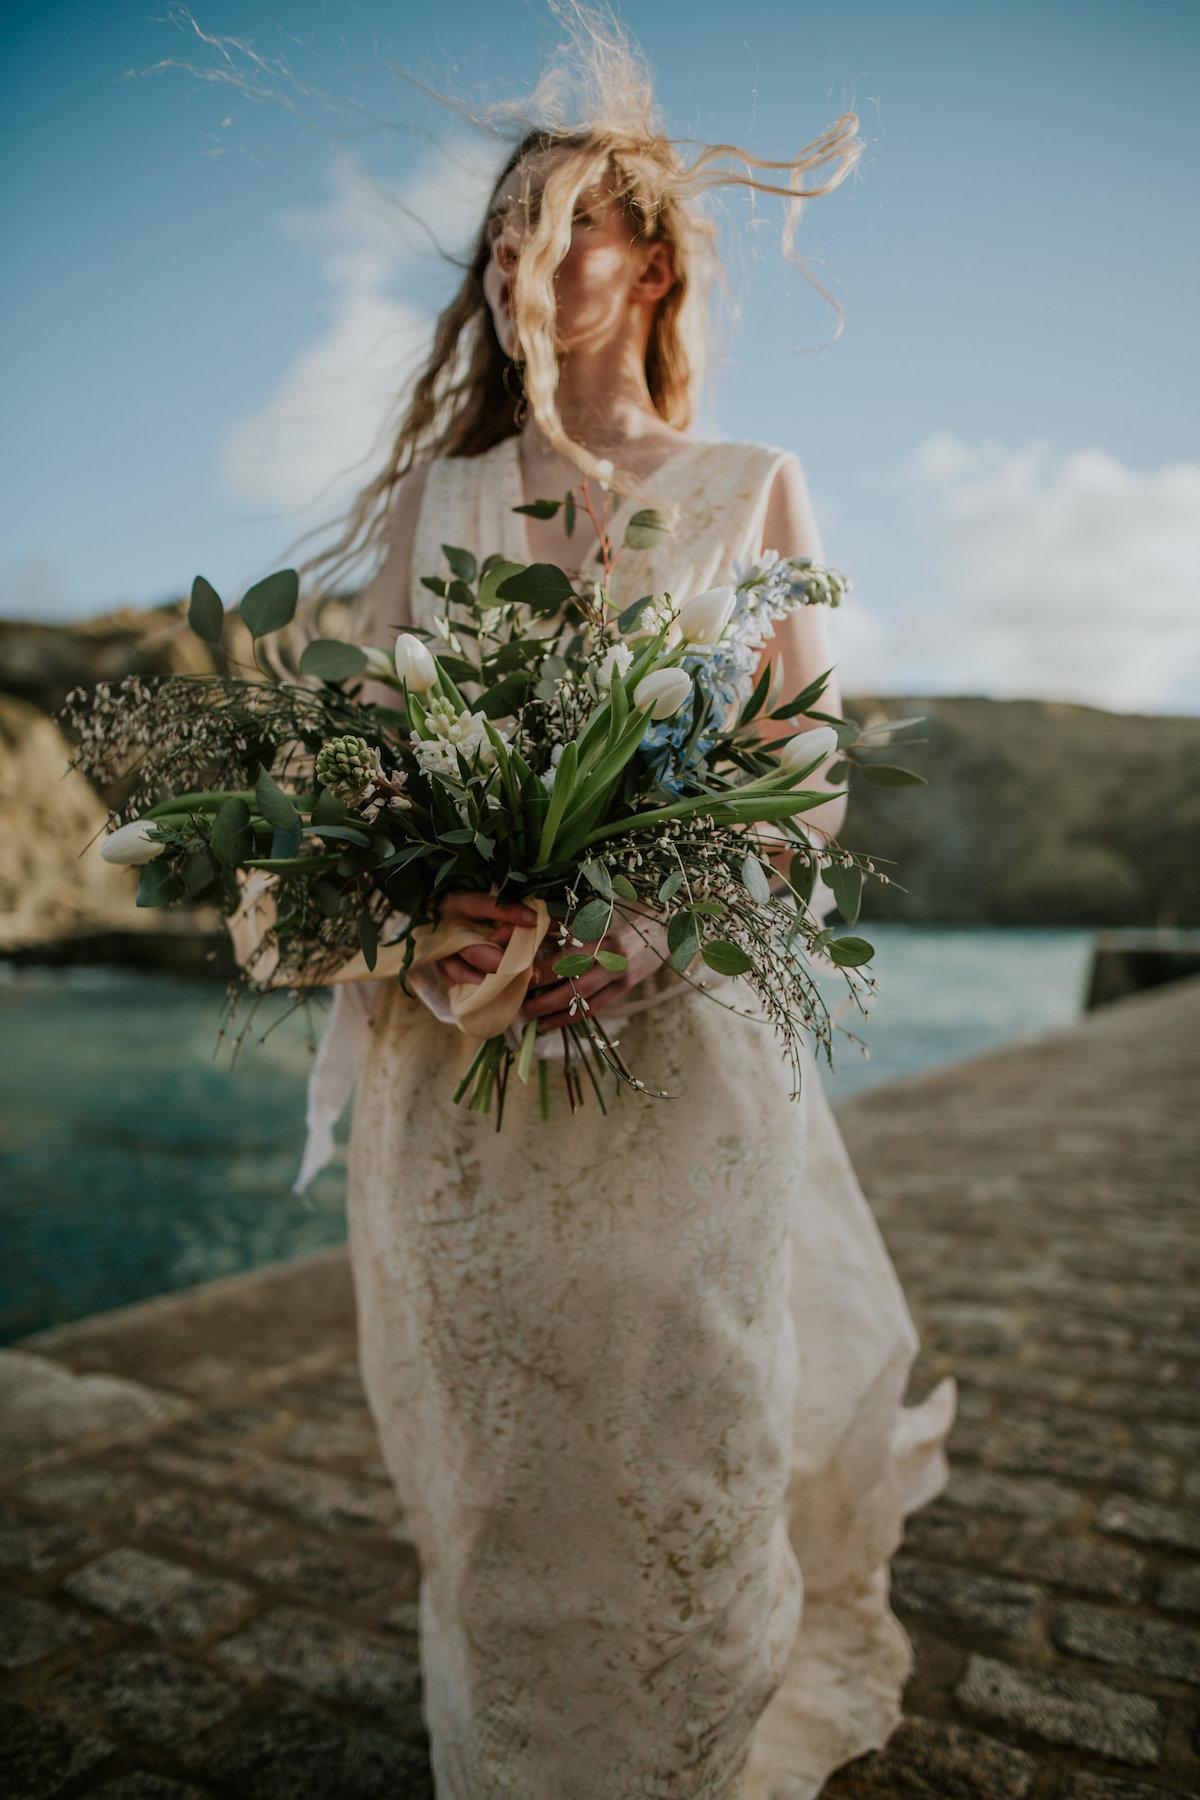 Loulabel Florist Bristol Creative Wedding Flowers 4.jpg